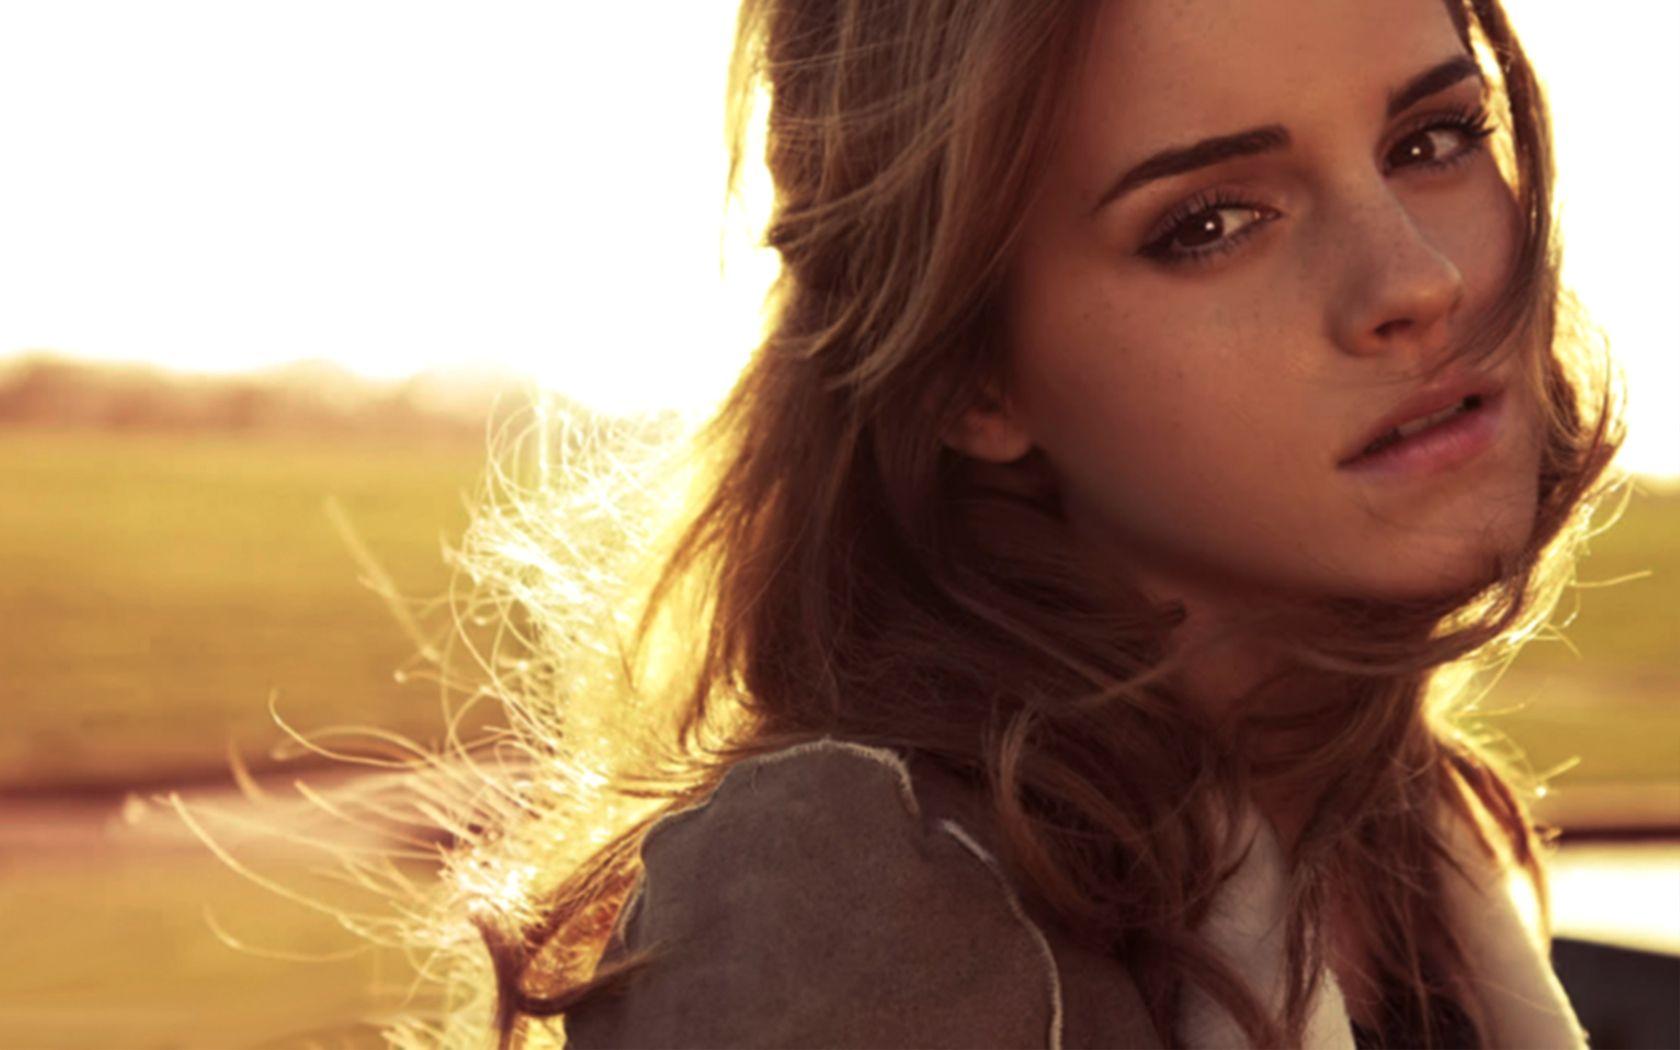 Emma Watson Wallpapers Free Download HD Hot Beautiful